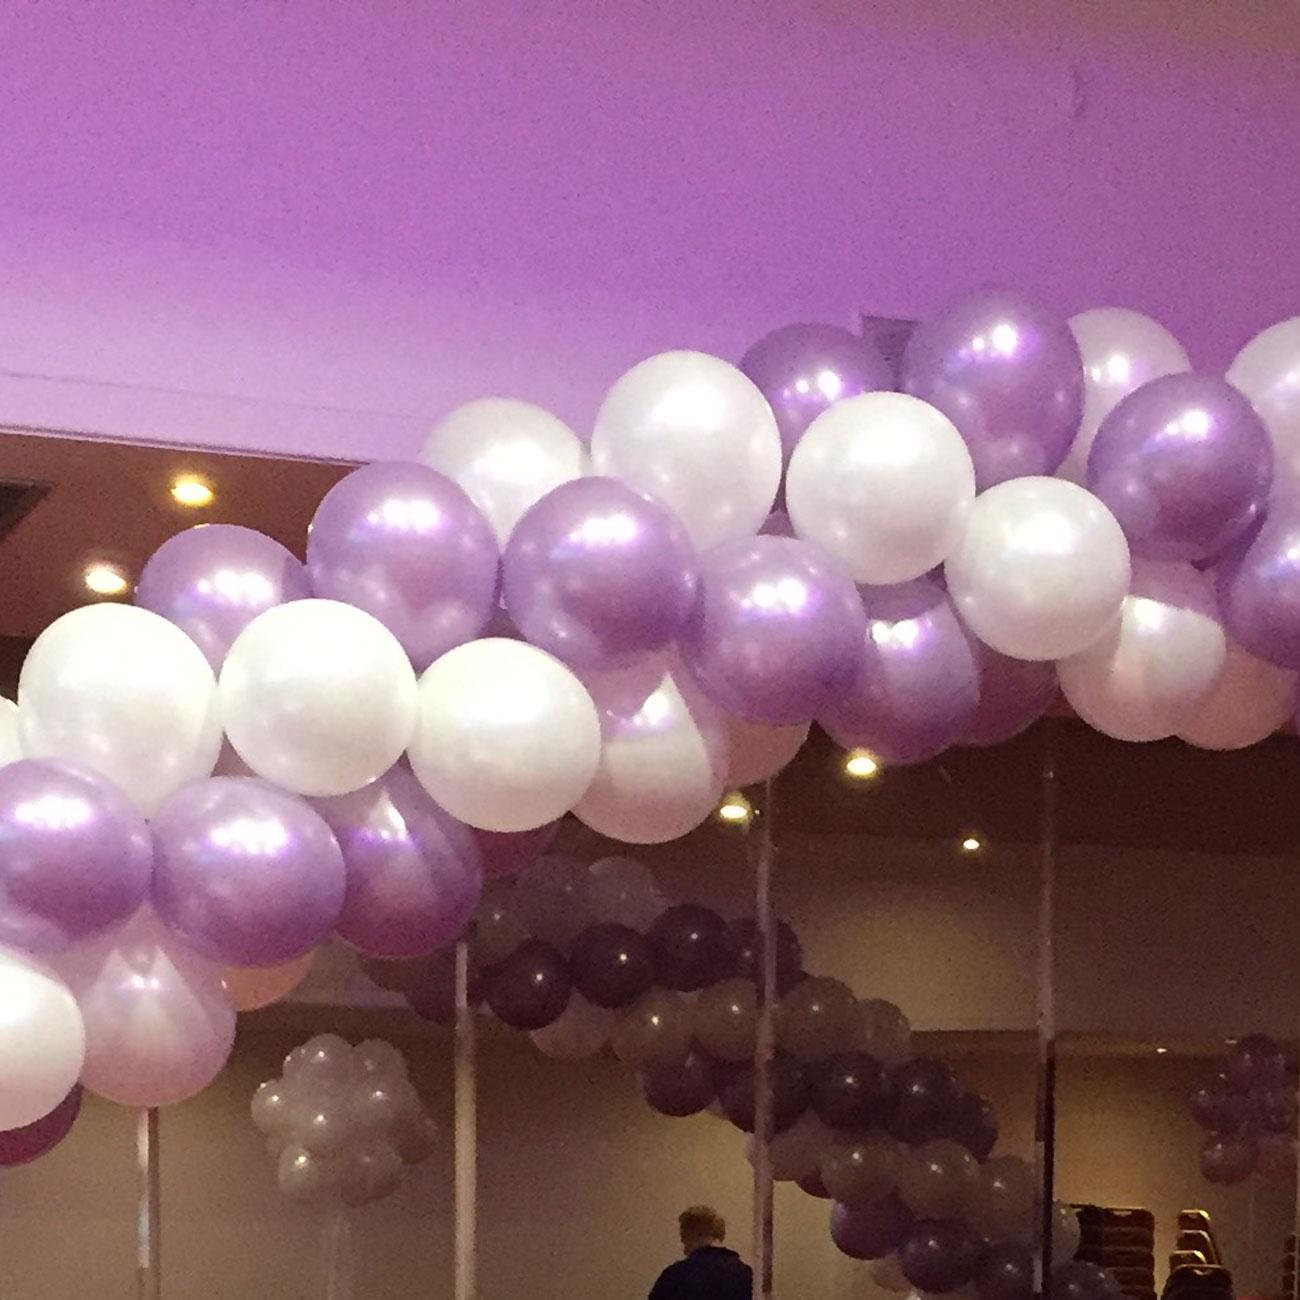 ballons-square-3.jpg